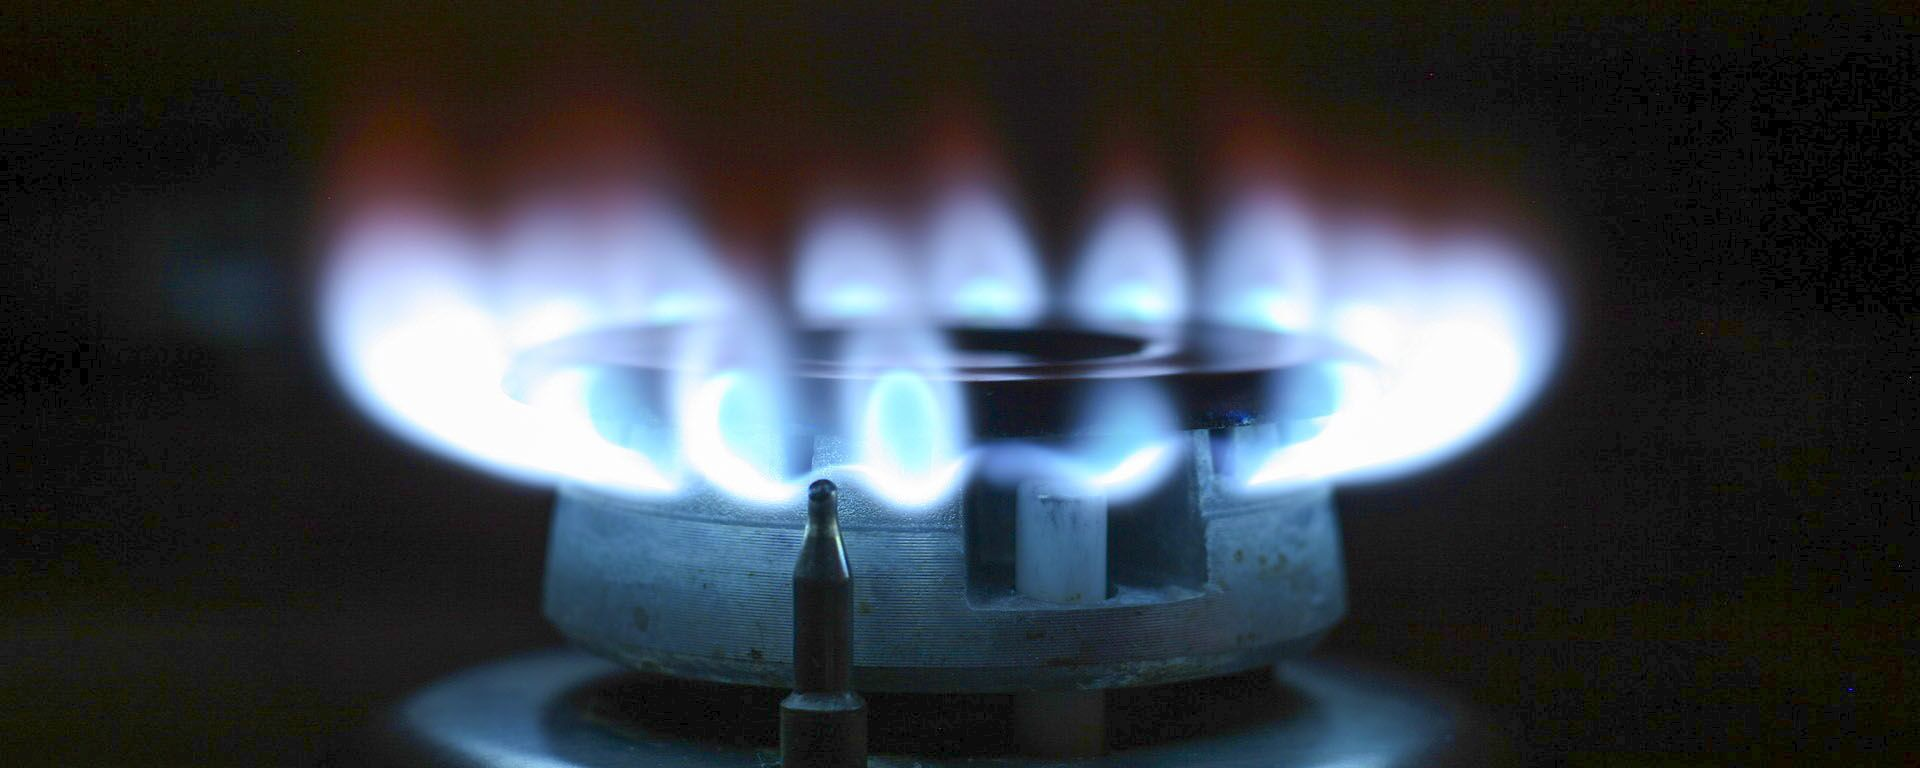 Cucina a gas - Sputnik Italia, 1920, 20.09.2021